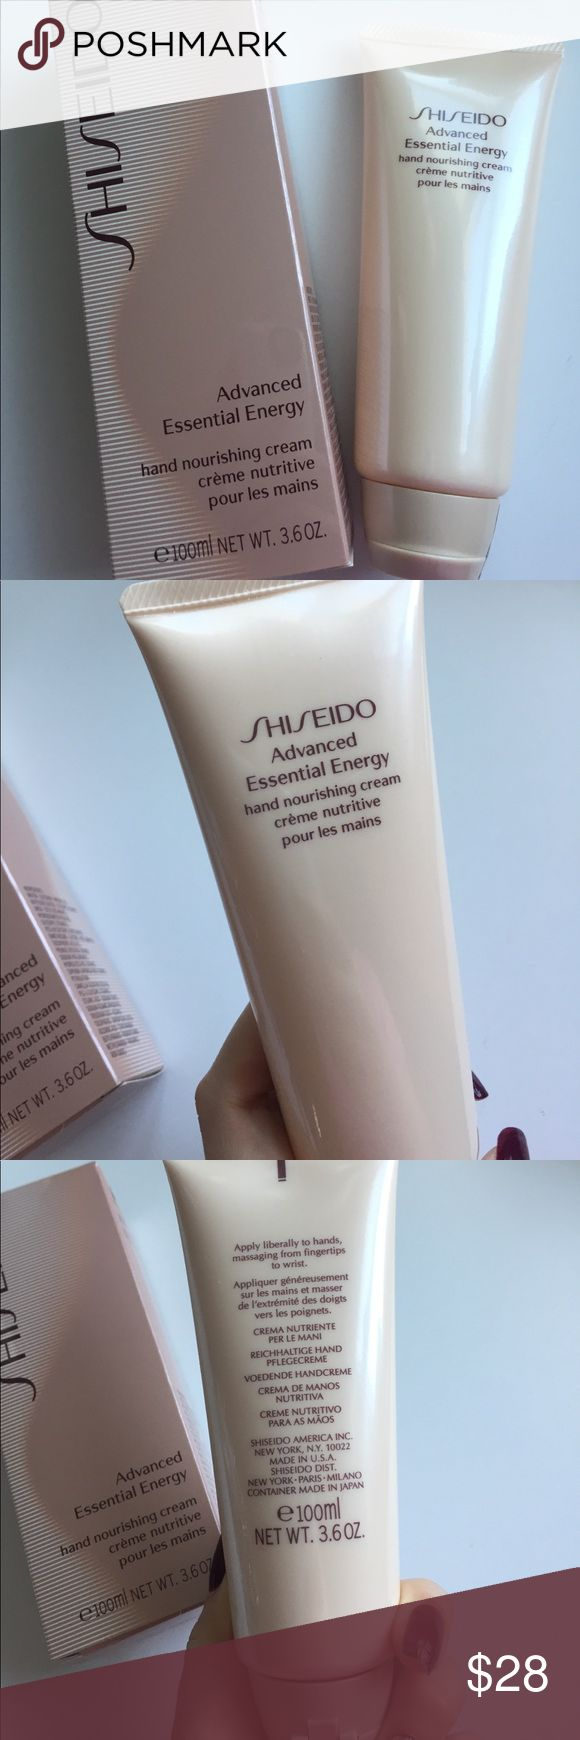 Shiseido Advanced Essential Energy Hand Cream Brand new never opened Shiseido Advanced Essential Energy Hand Nourishing Cream. Sephora Makeup Luminizer